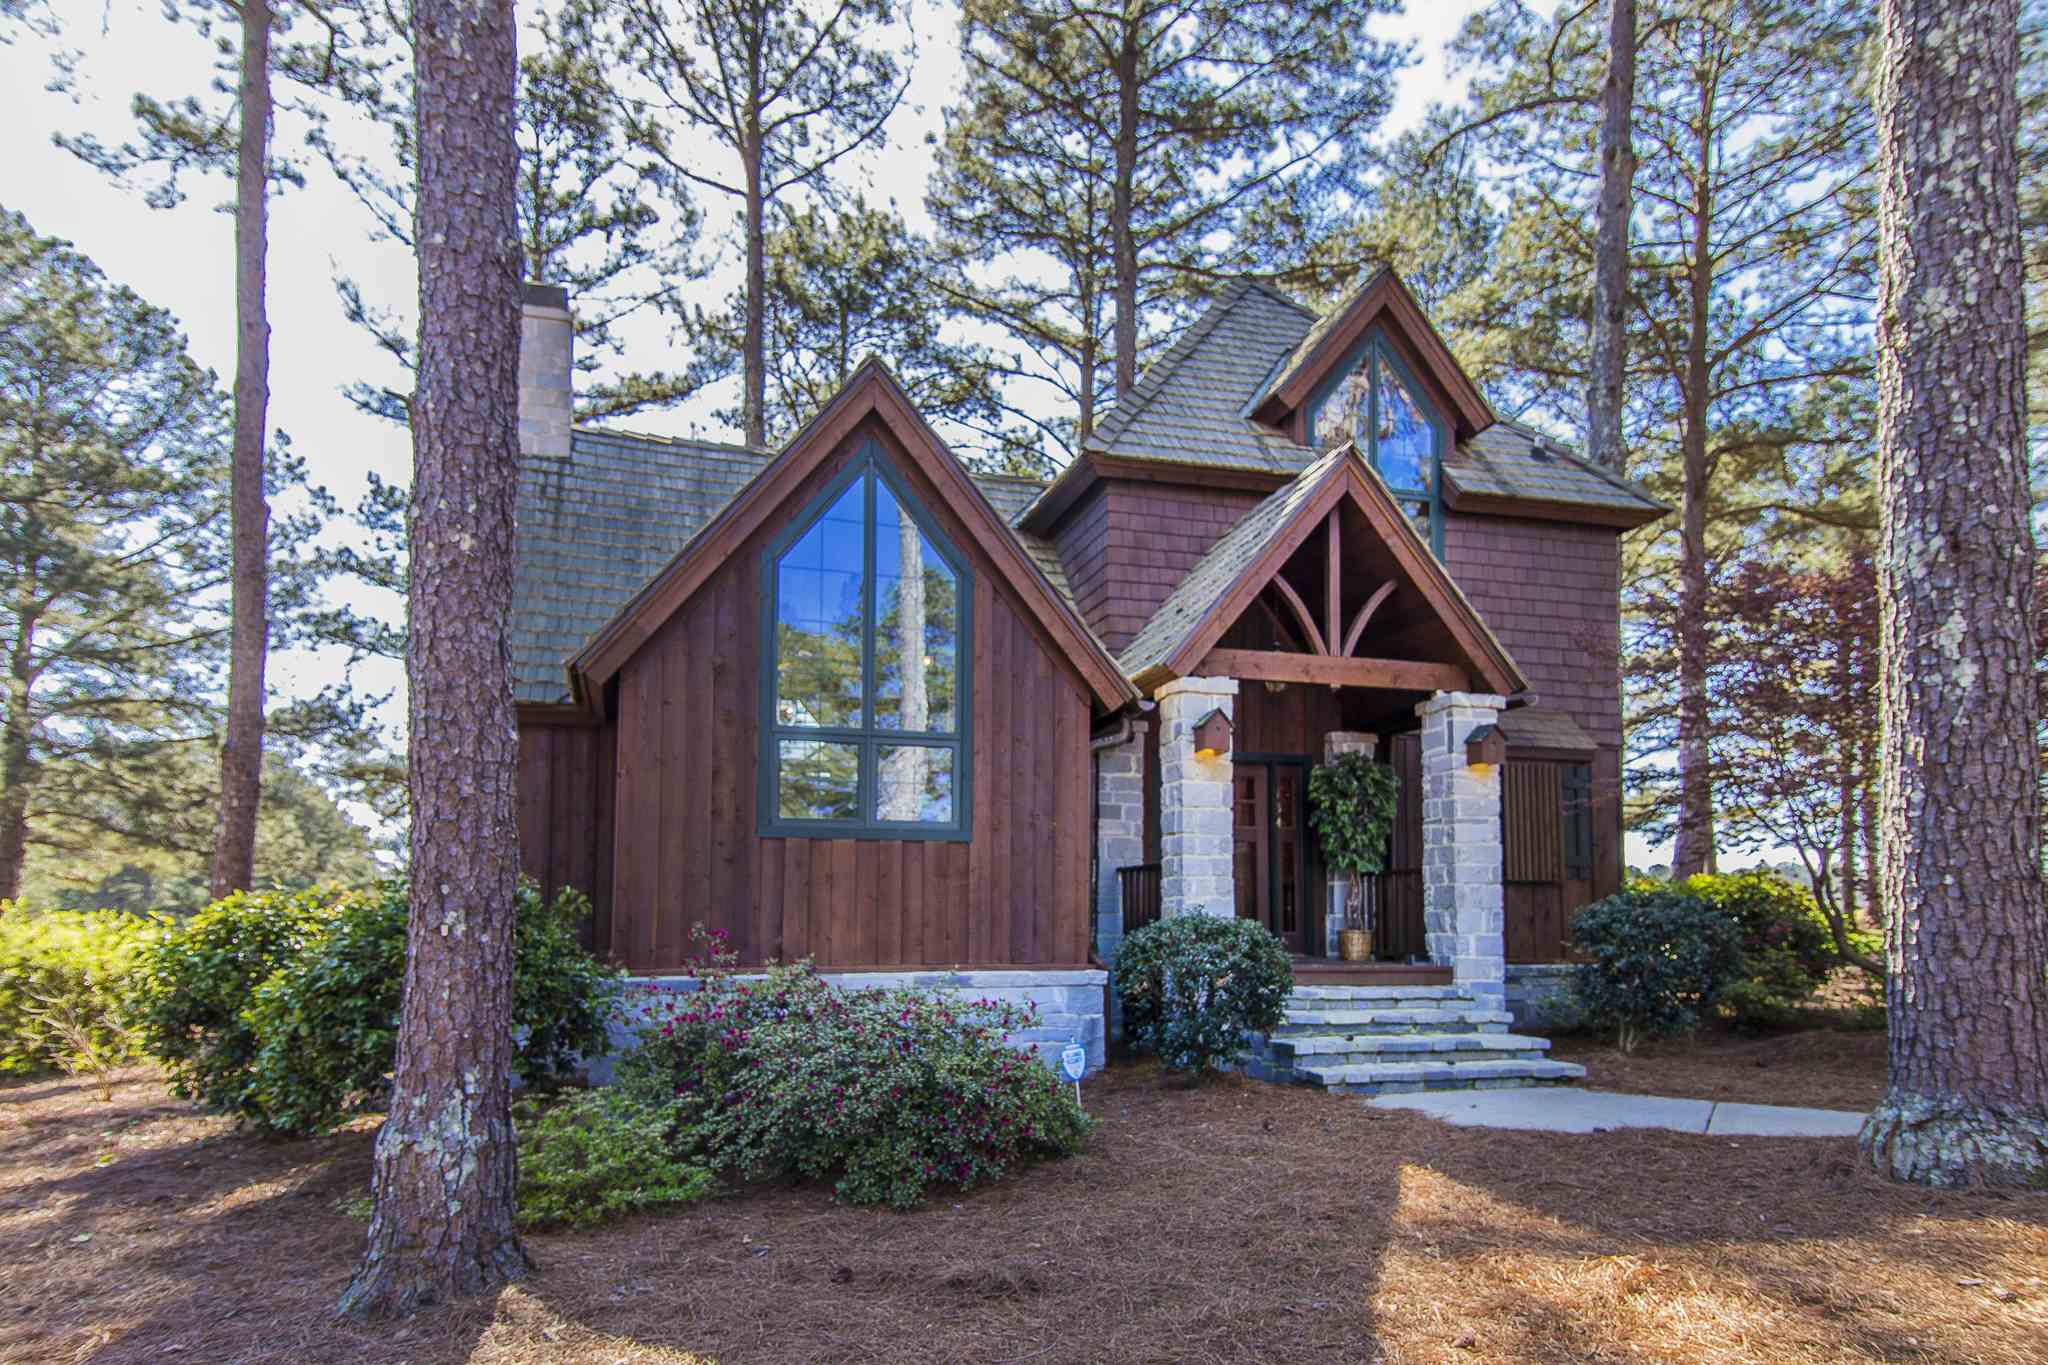 134 SECOFFEE DRIVE, Lake Oconee in Putnam County, GA 31024 Home for Sale